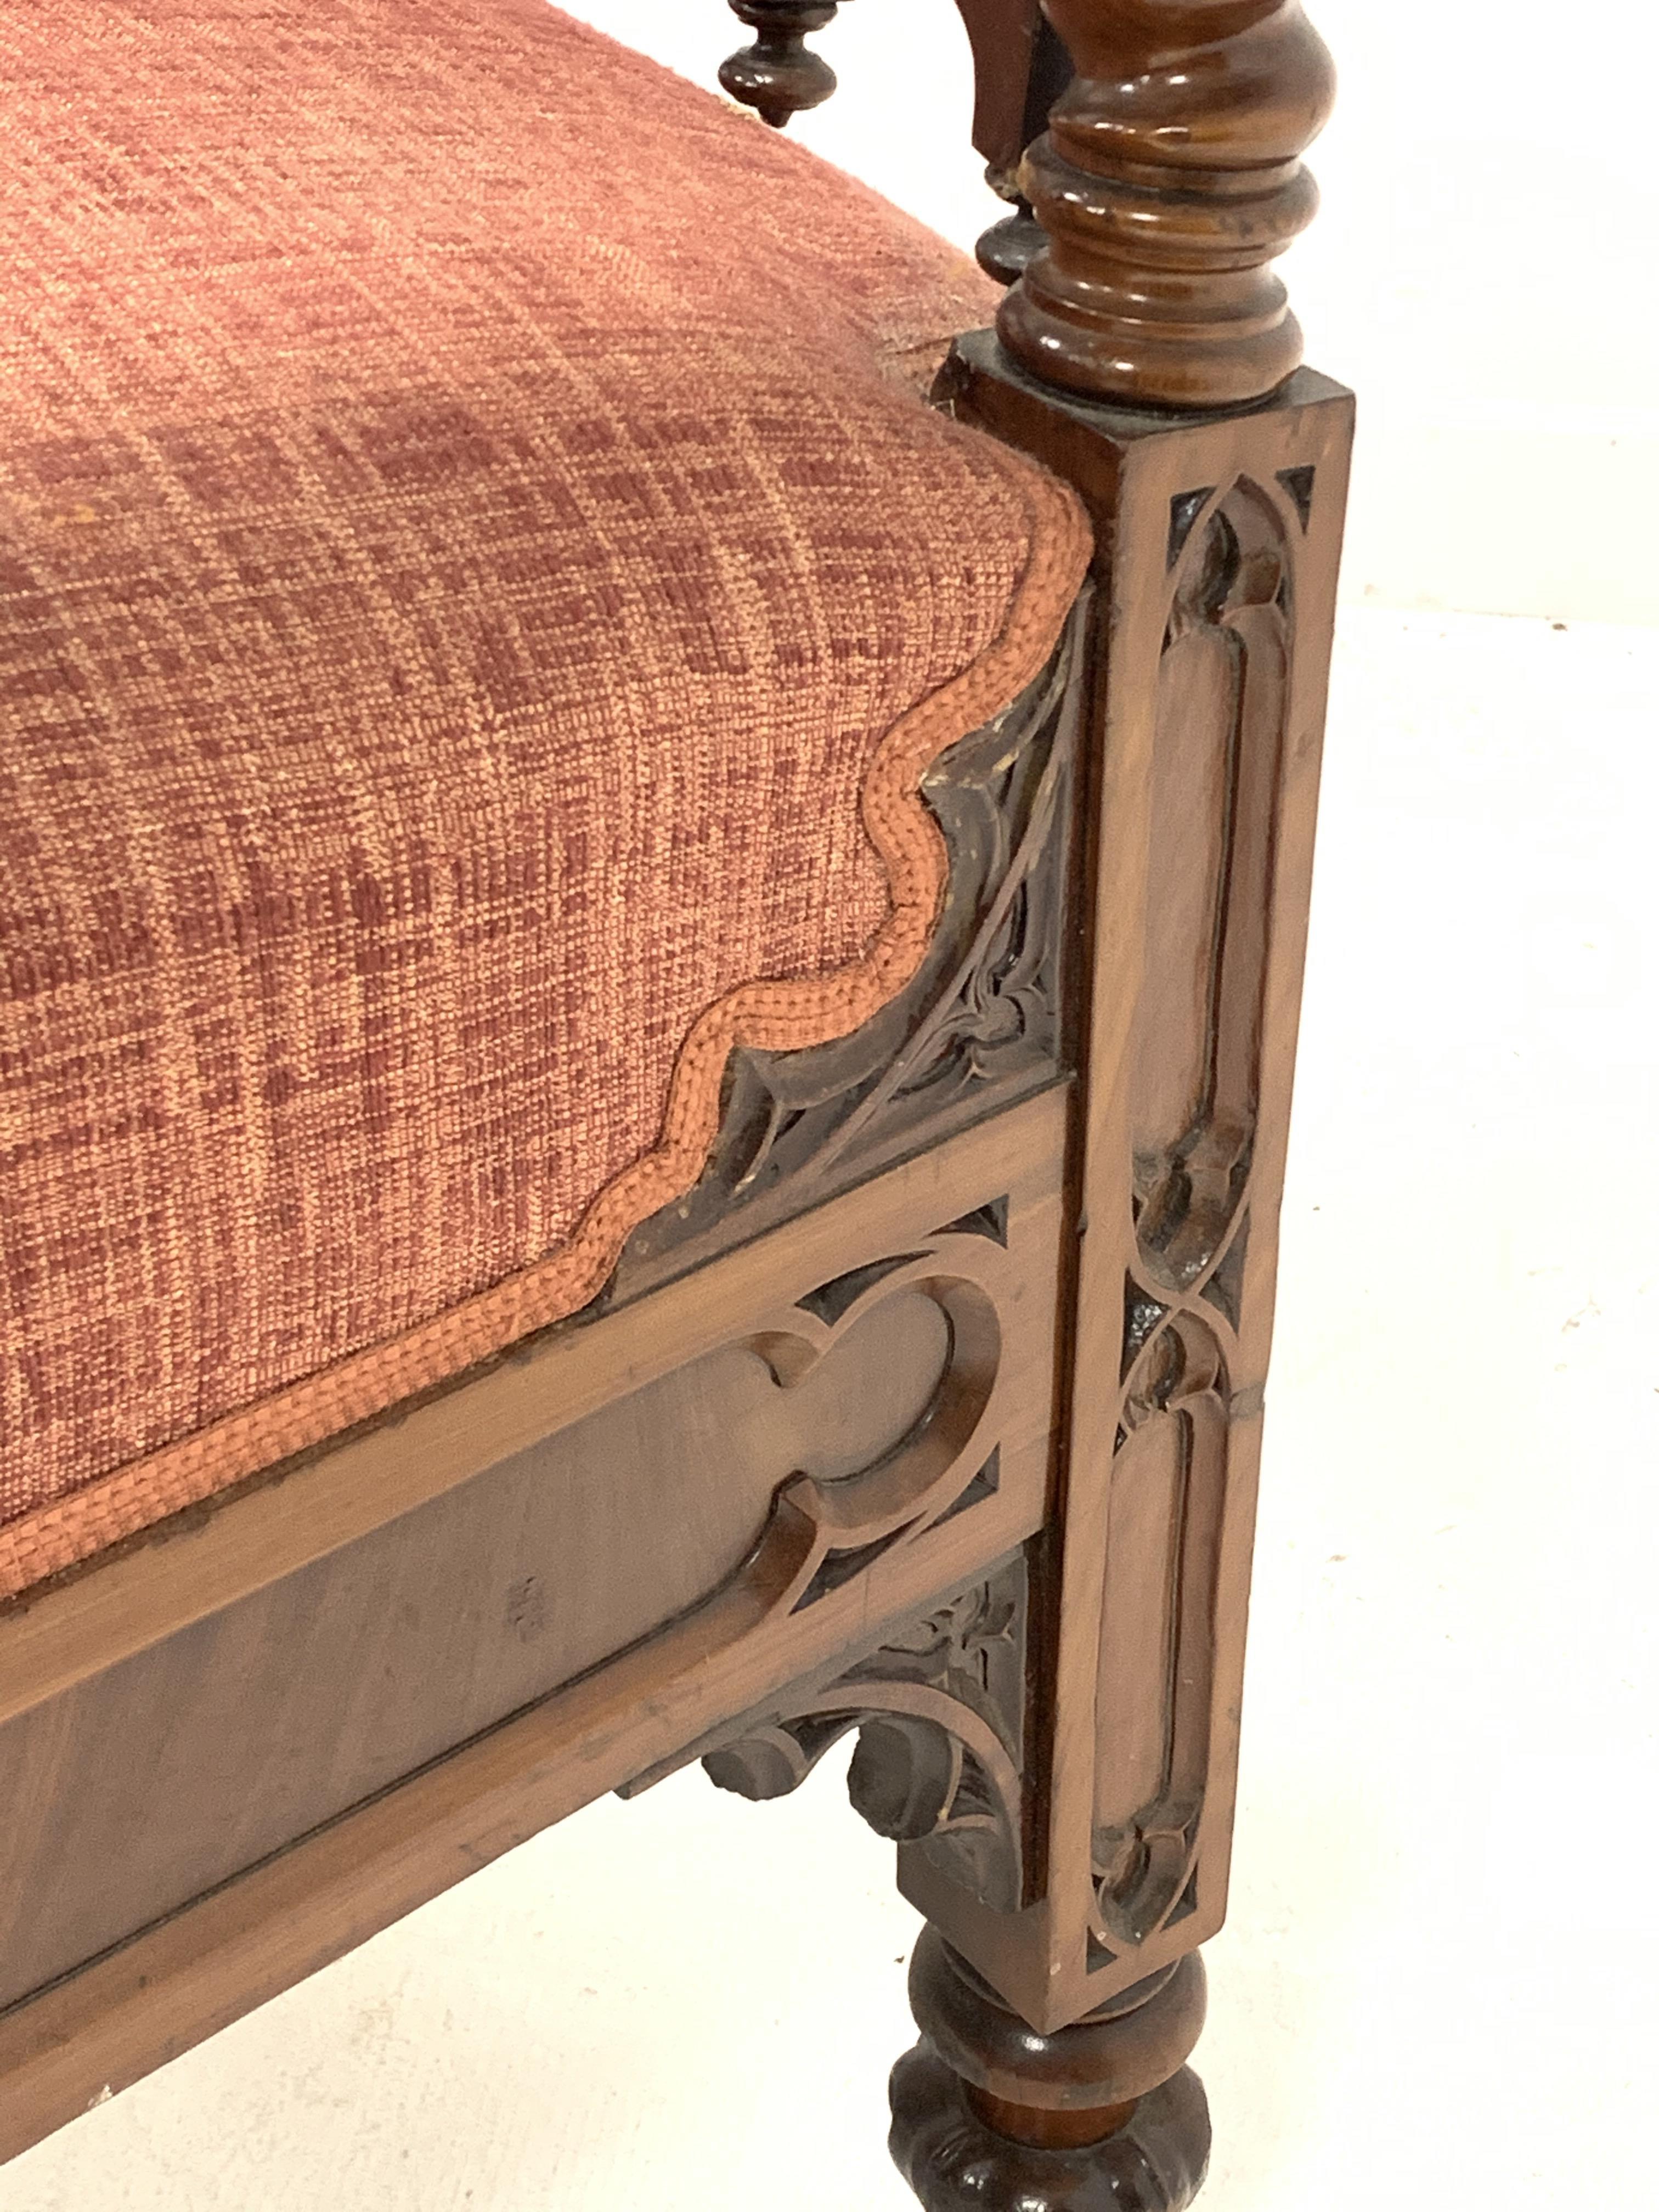 19th century Puginesque mahogany throne chair - Image 5 of 6